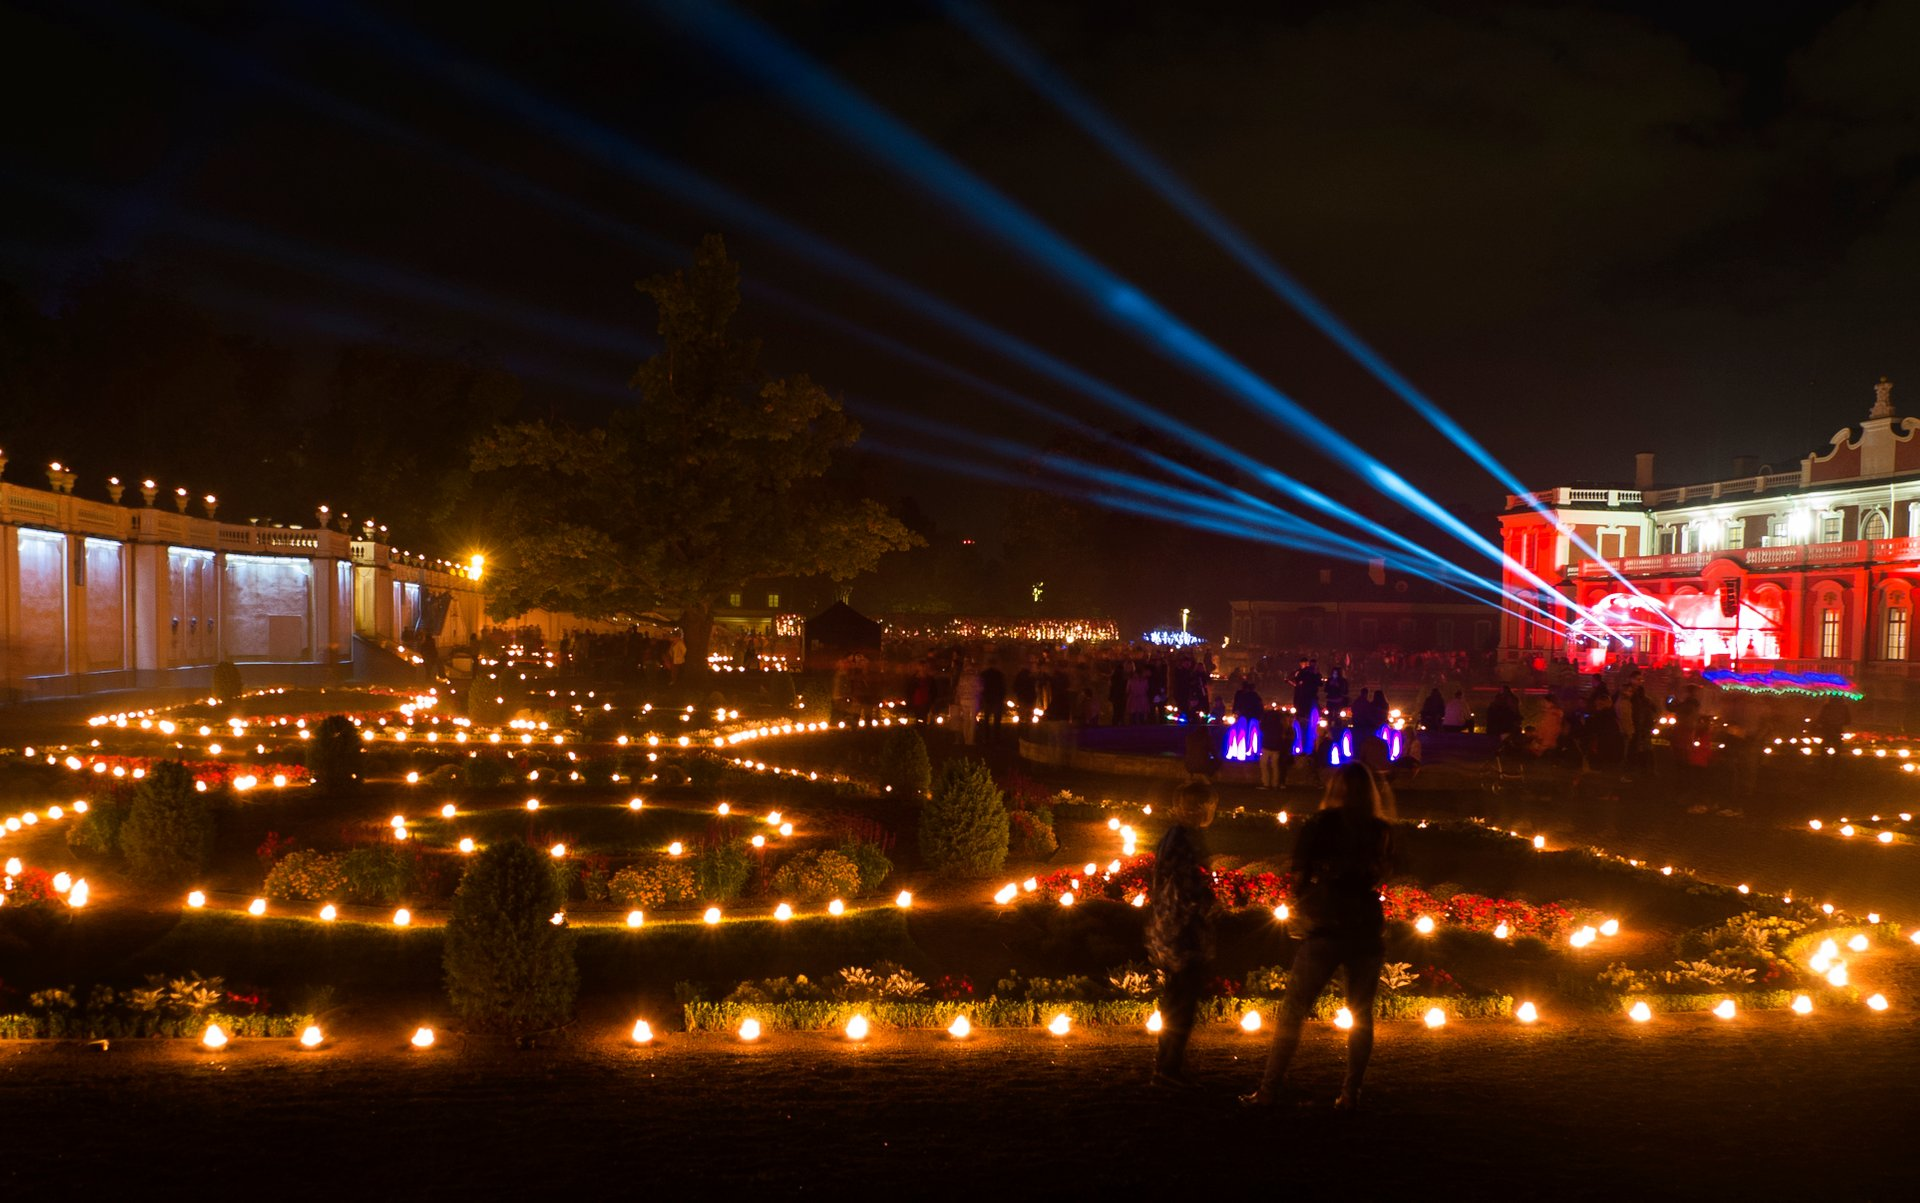 Light Walks in Kadriorg in Estonia 2020 - Best Time